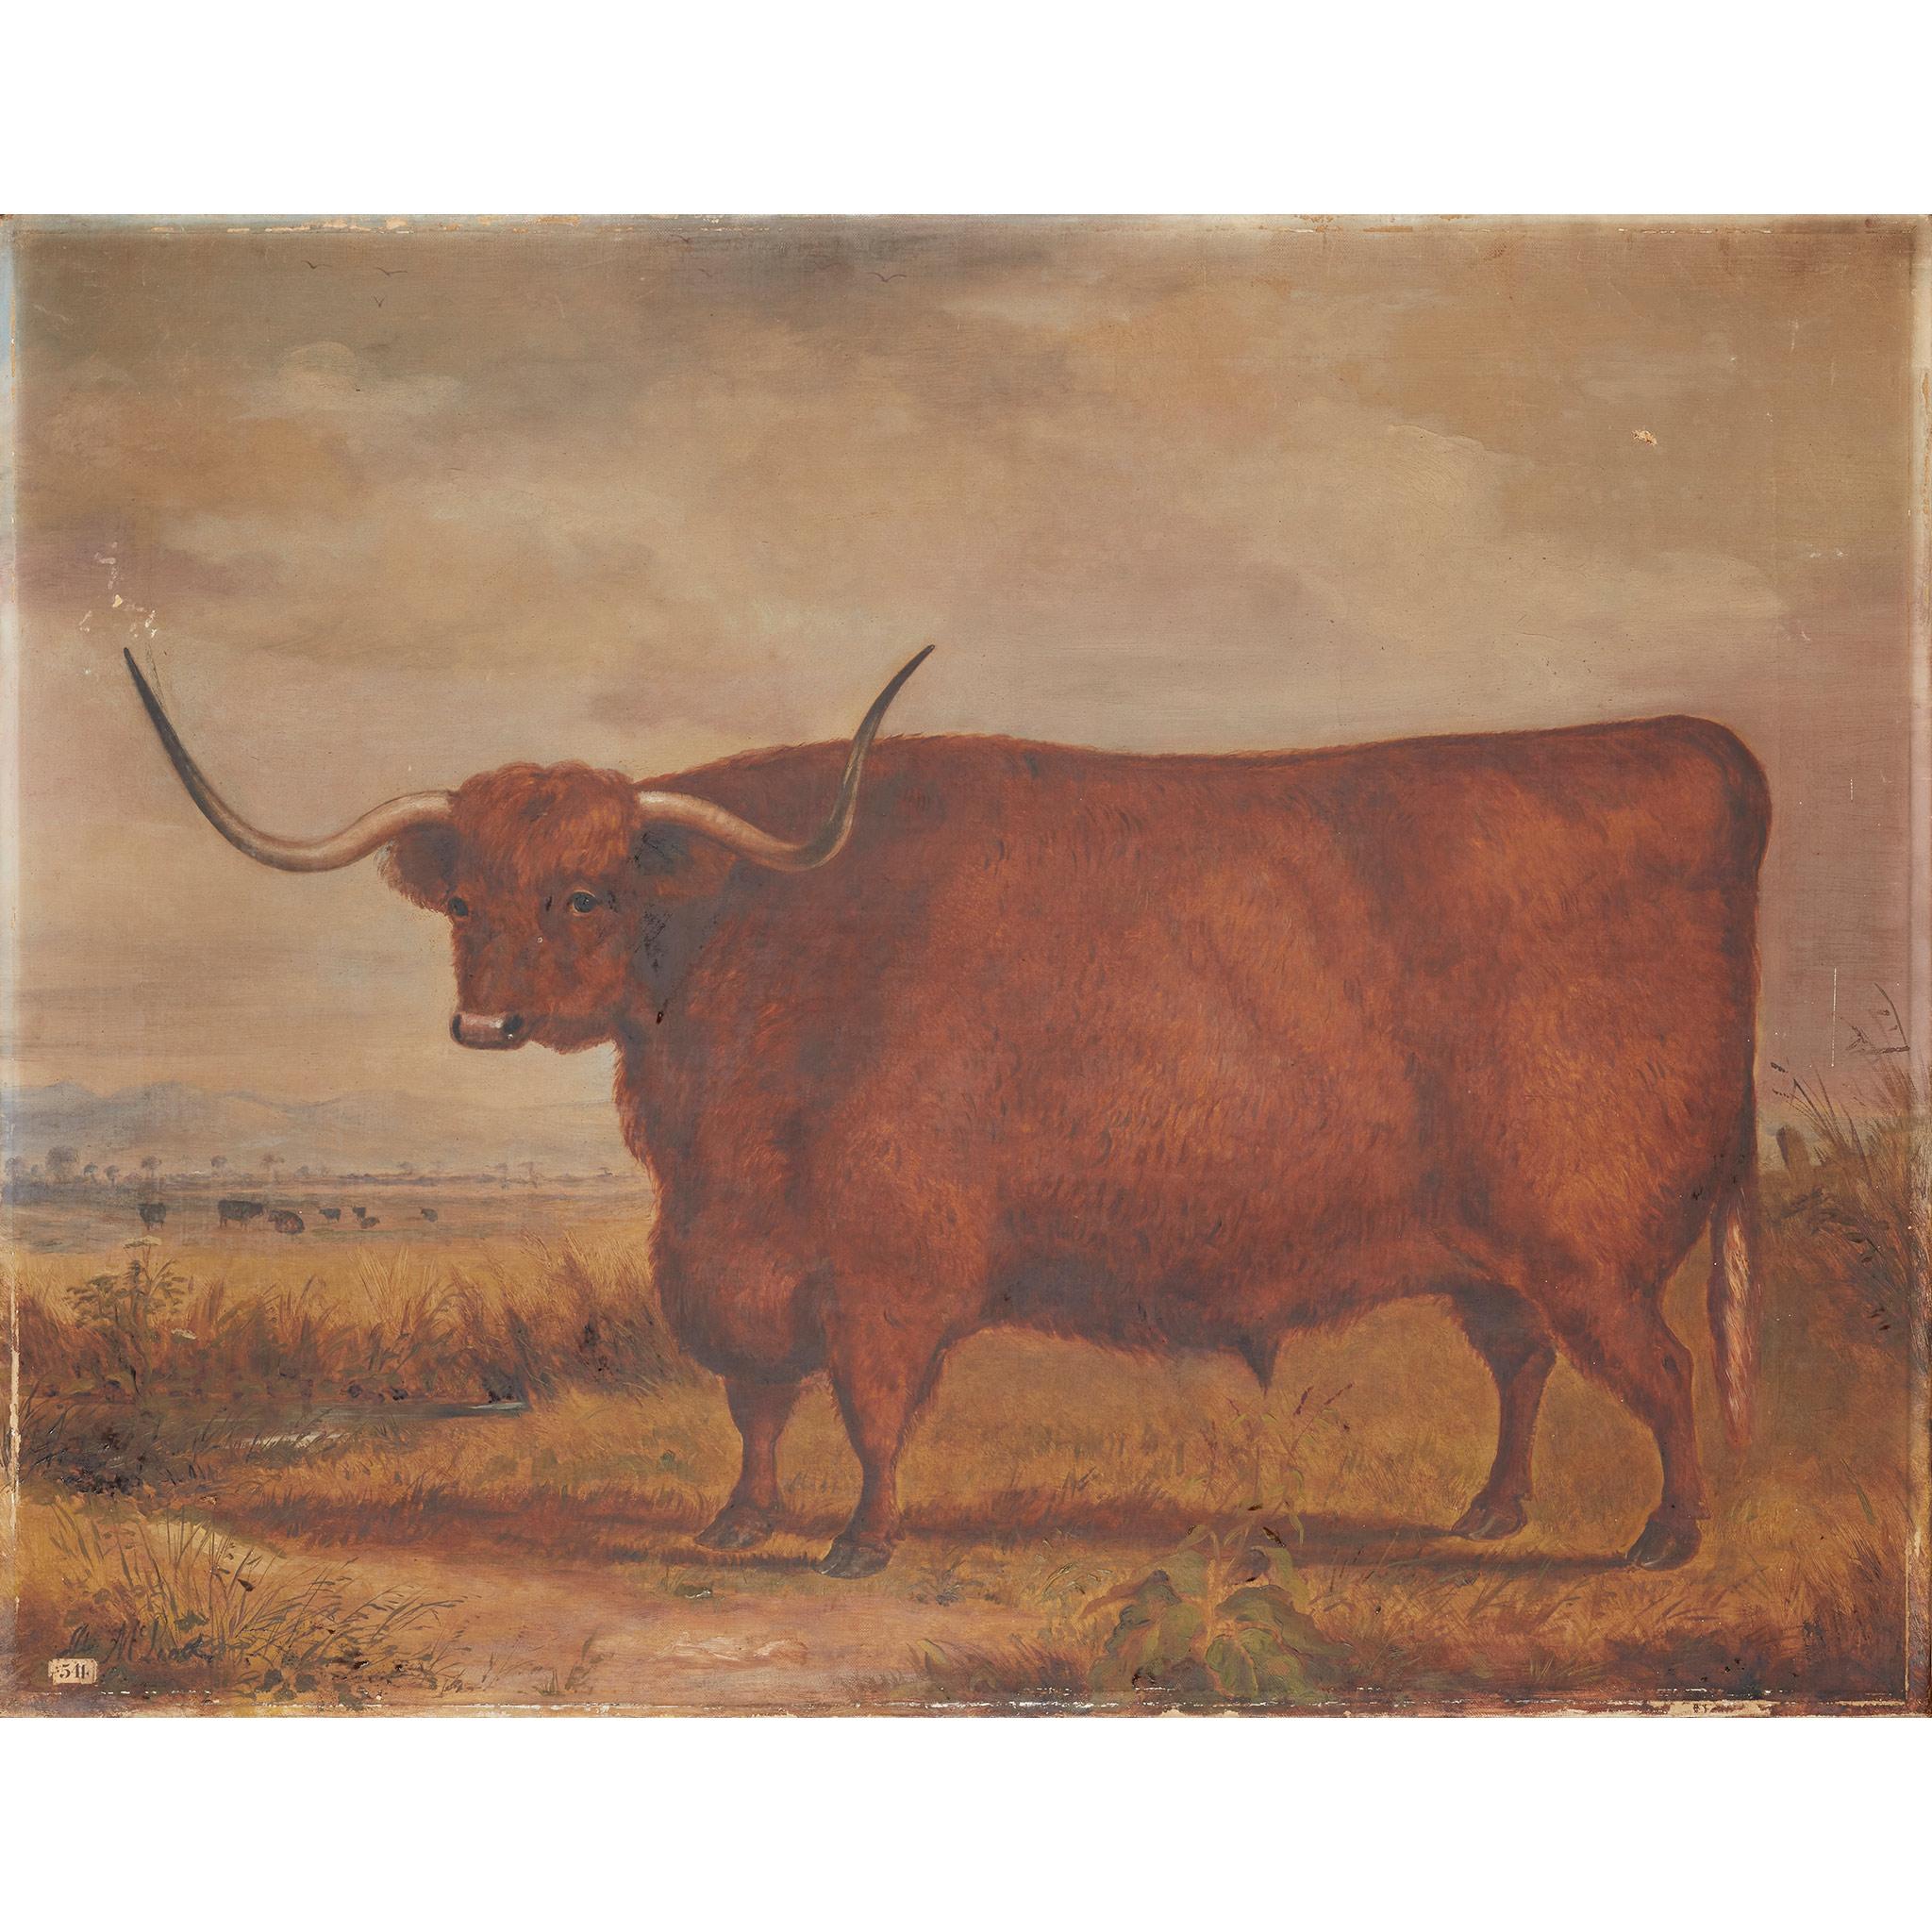 JOHN MCLEOD (SCOTTISH FL.1846-1872) STUDY OF A WEST HIGHLAND OX AGED 5 YEARS